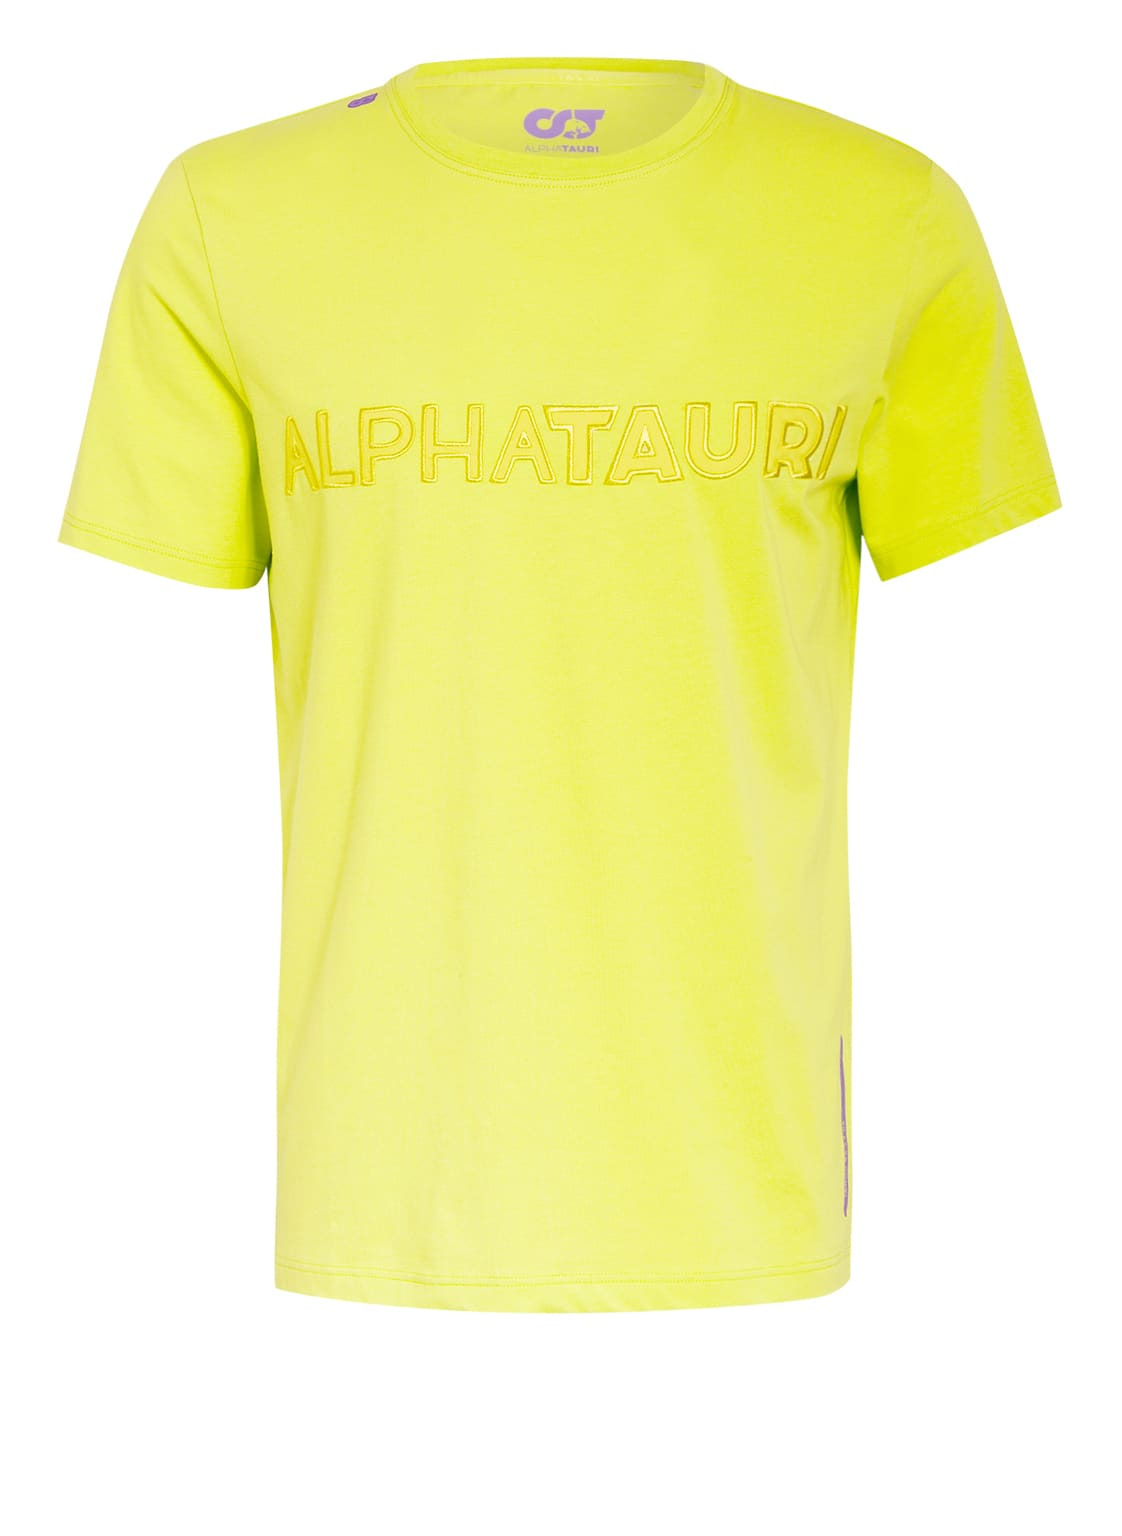 Image of Alphatauri T-Shirt Janos v2.y4.02 gruen